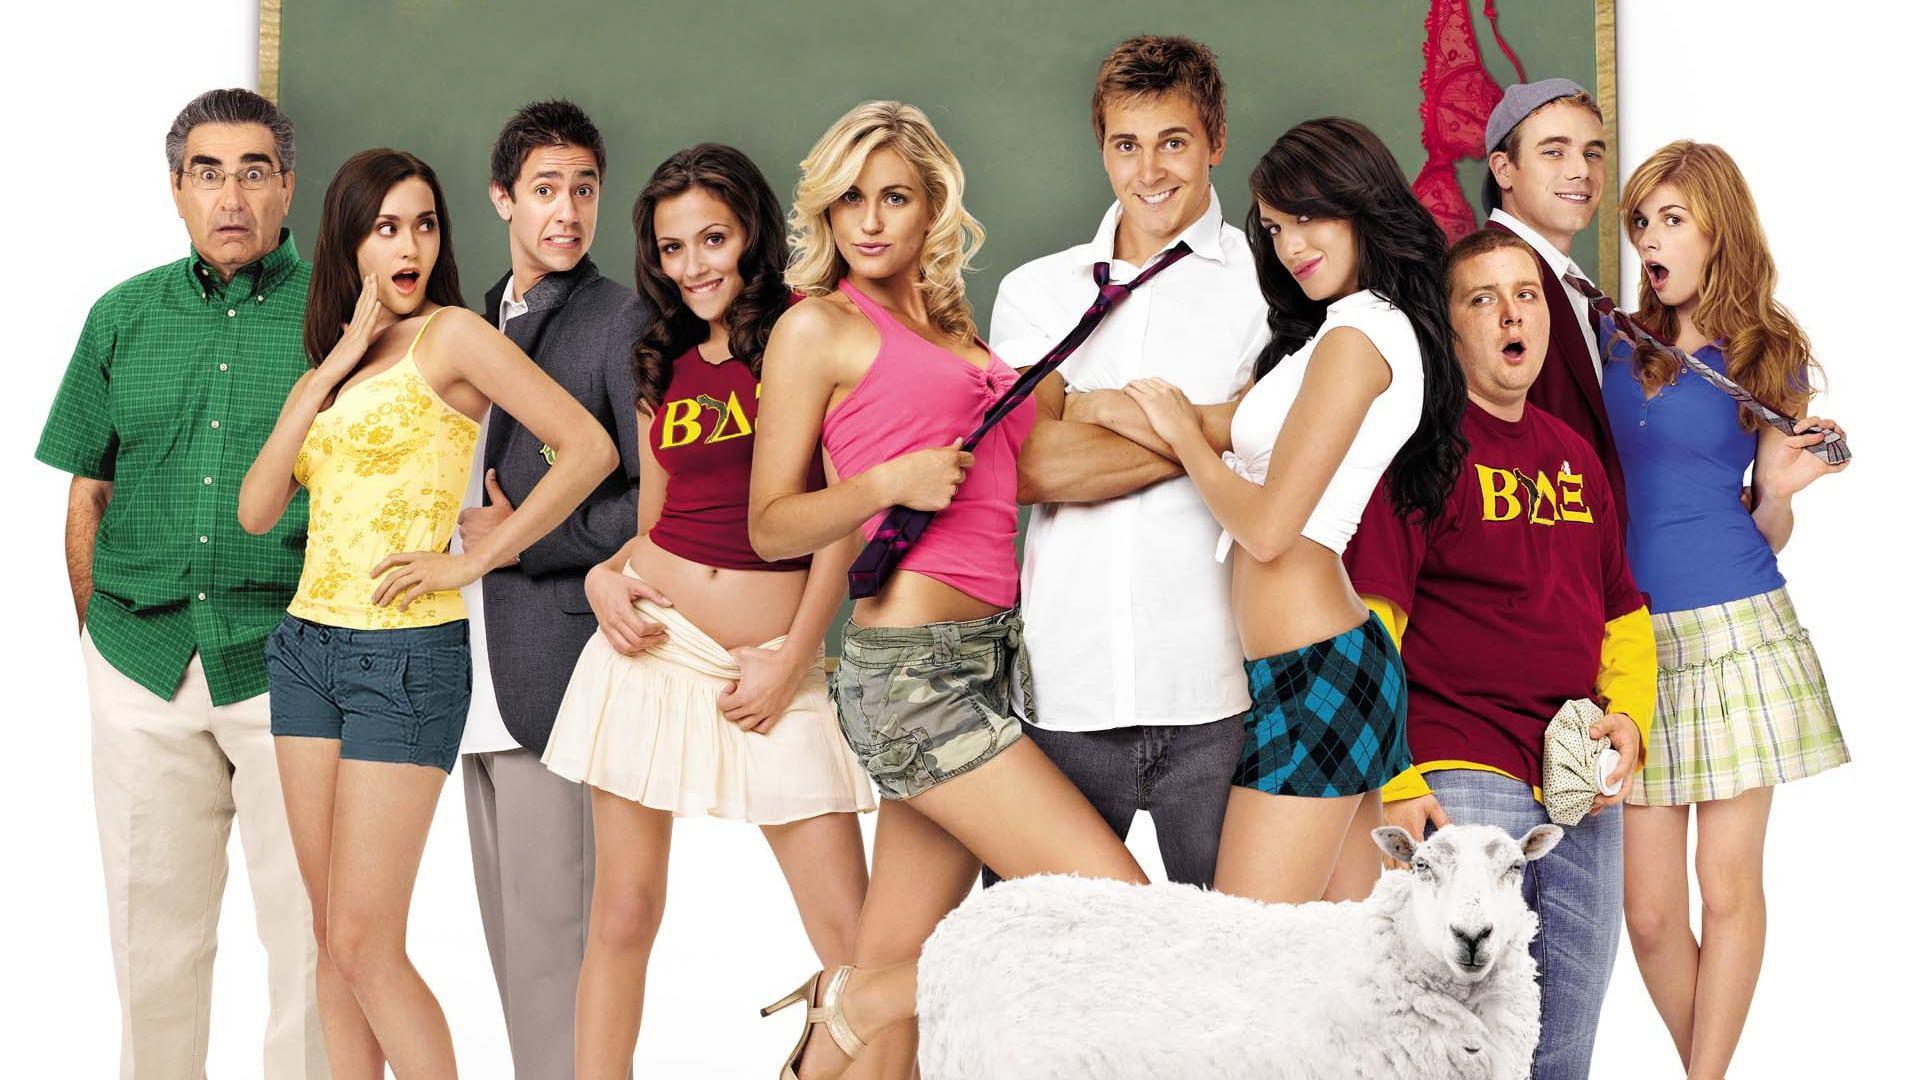 American Pie Presents: Beta House 2007 123movies